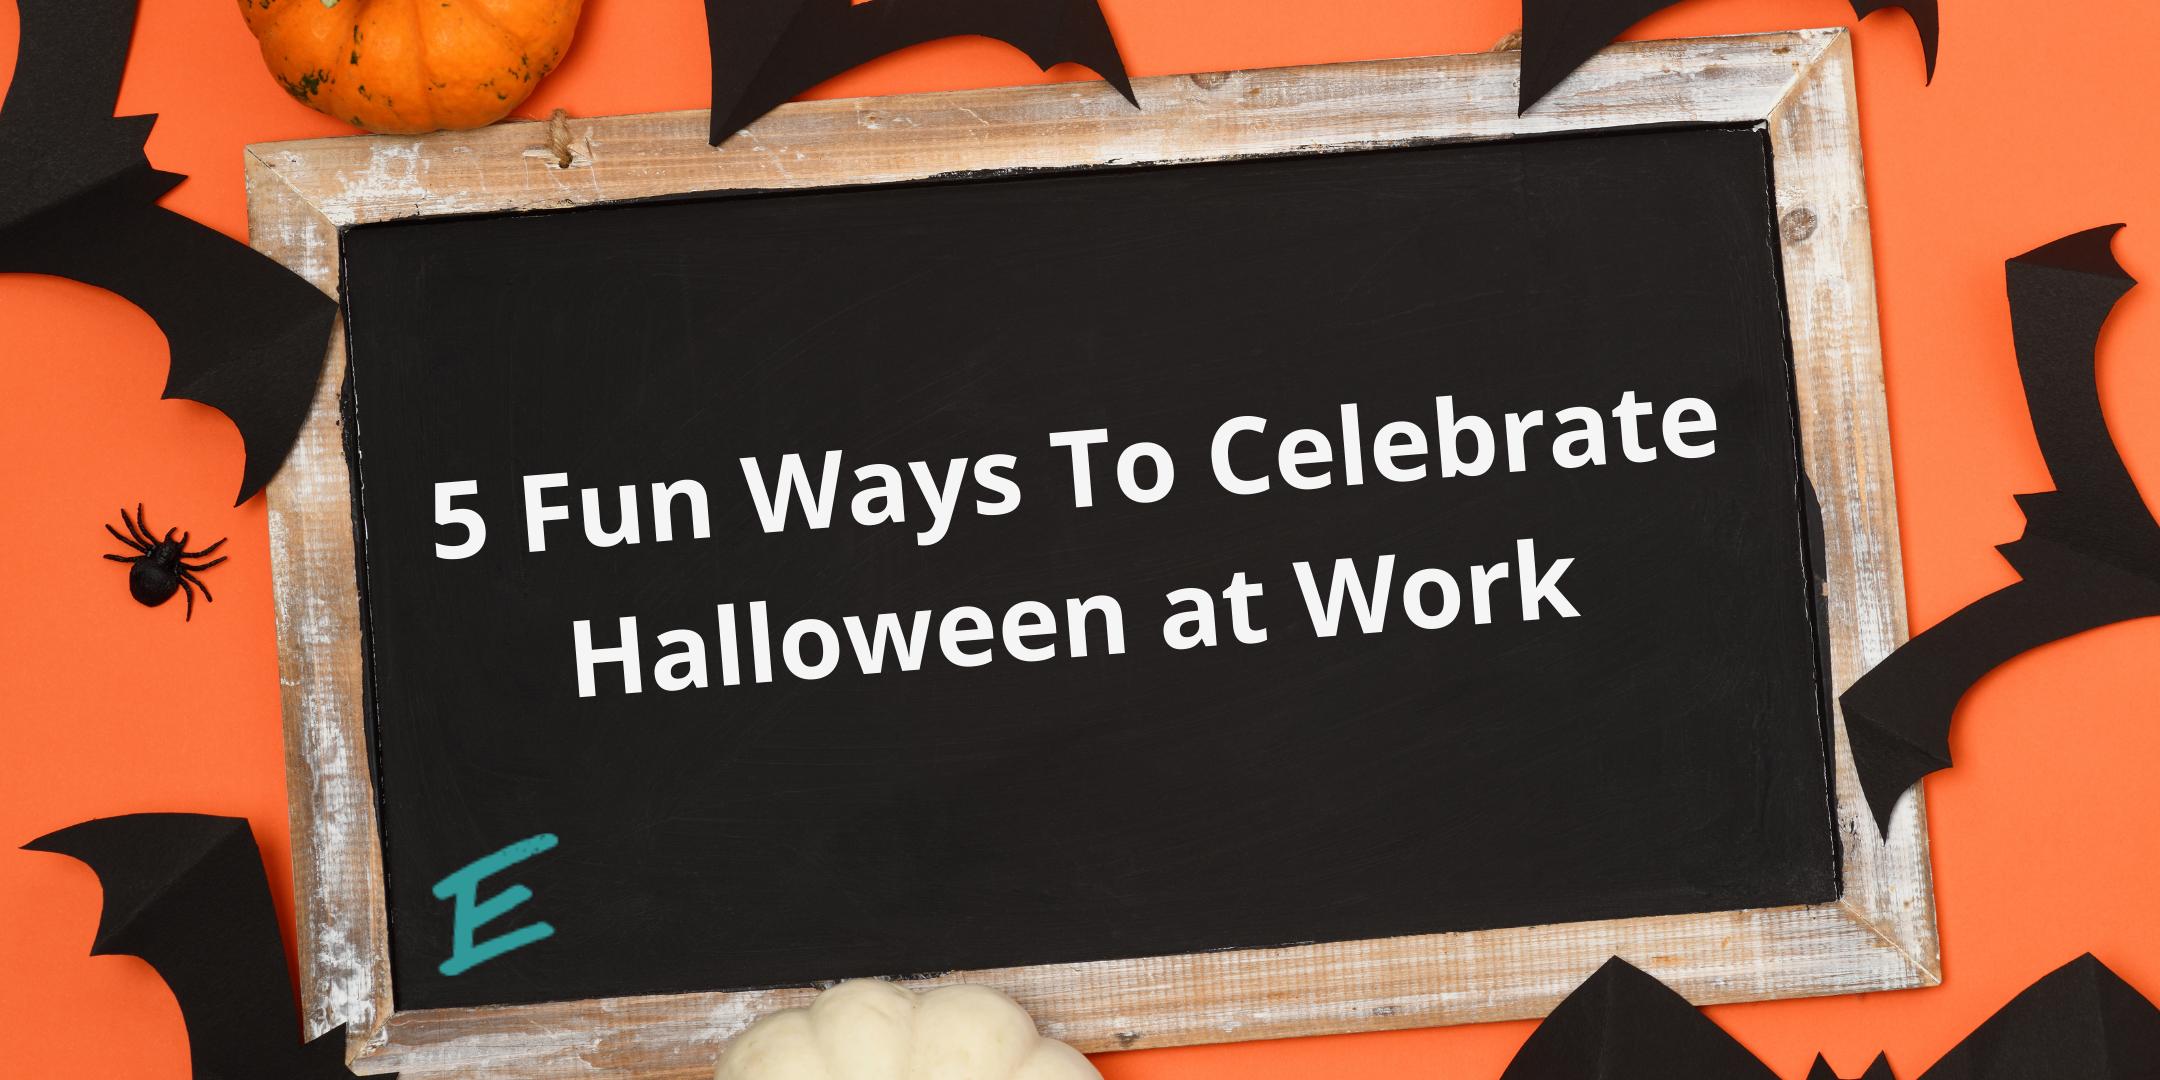 5-fun-ways-to-celebrate-halloween-at-work